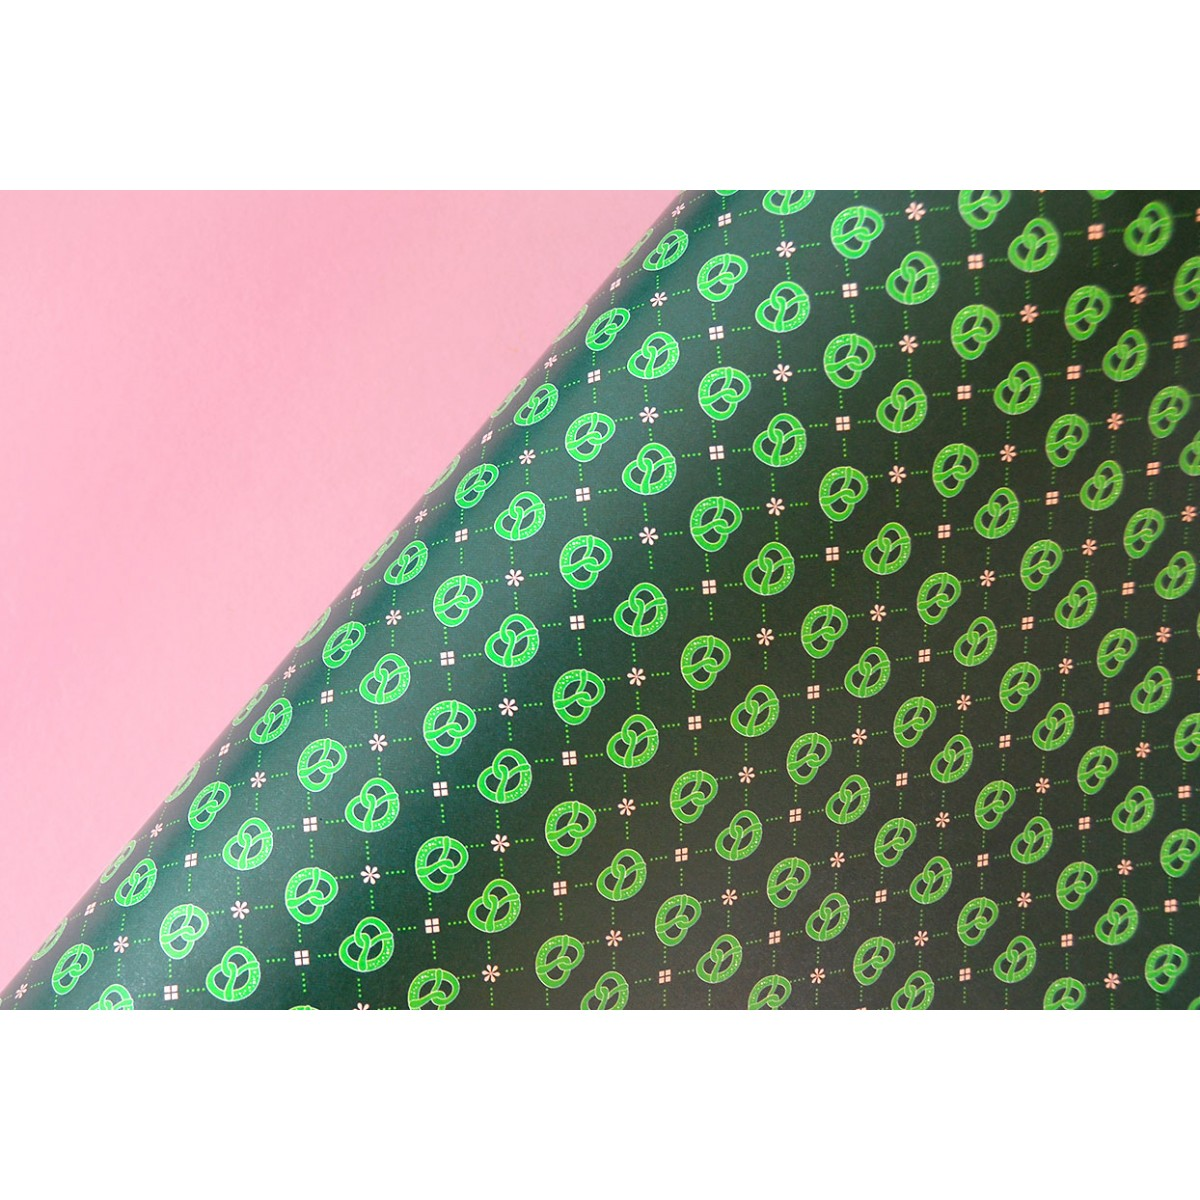 Geschenkpapier BREZEN waldgrün // 3 Bögen